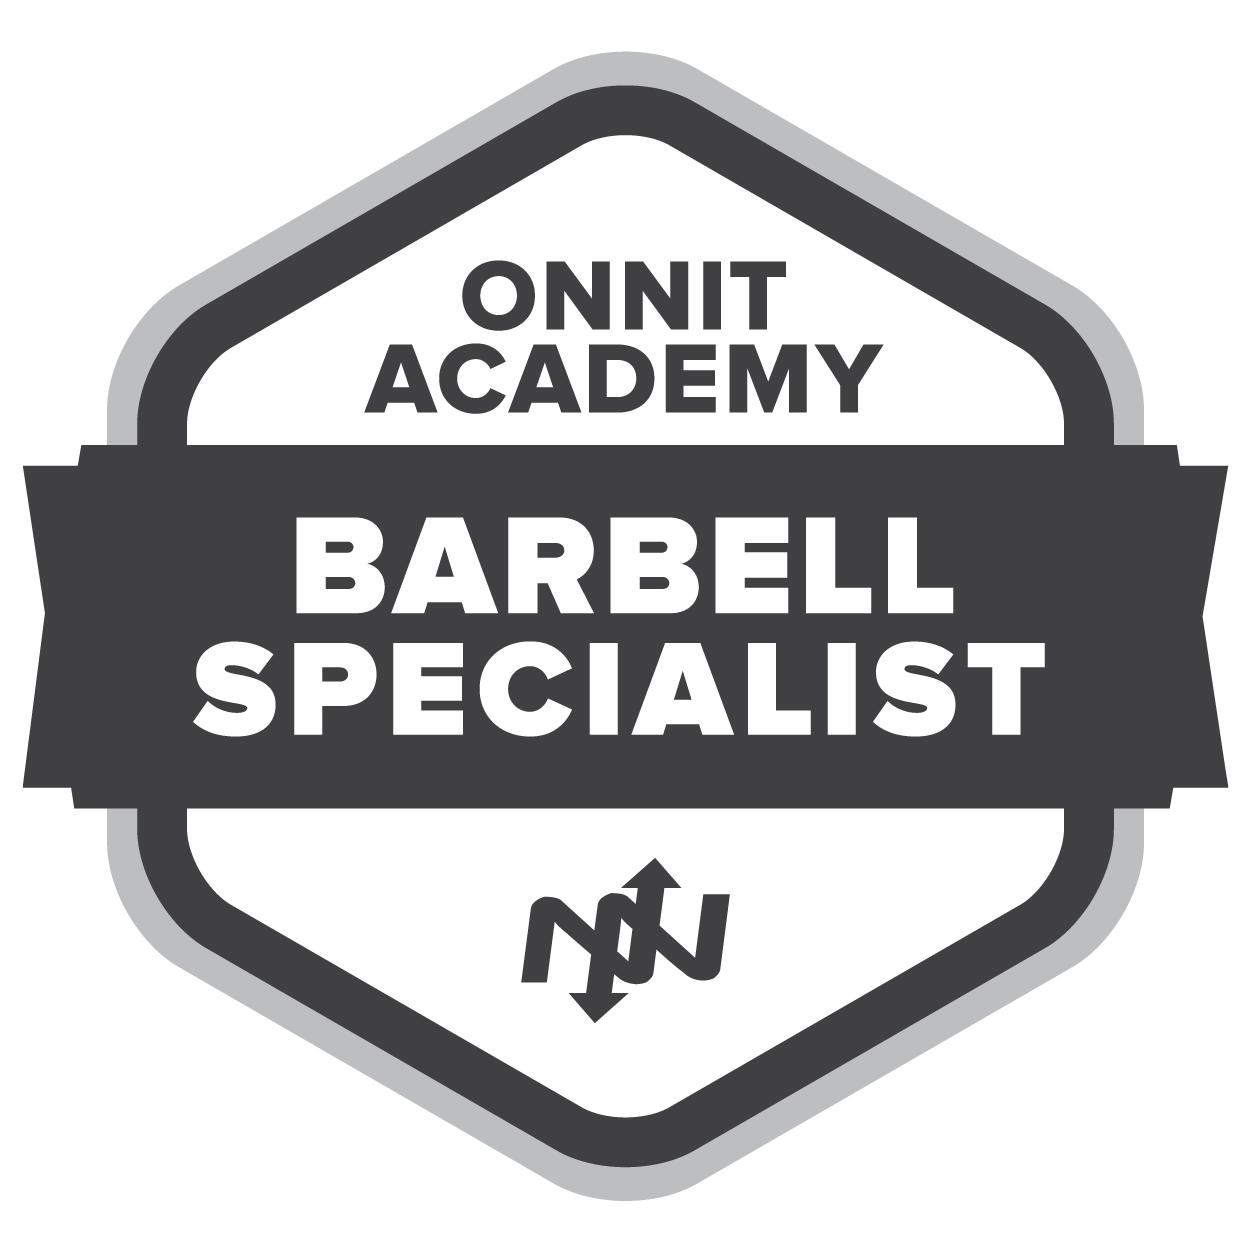 Onnit Academy - Barbell Specialist.jpg